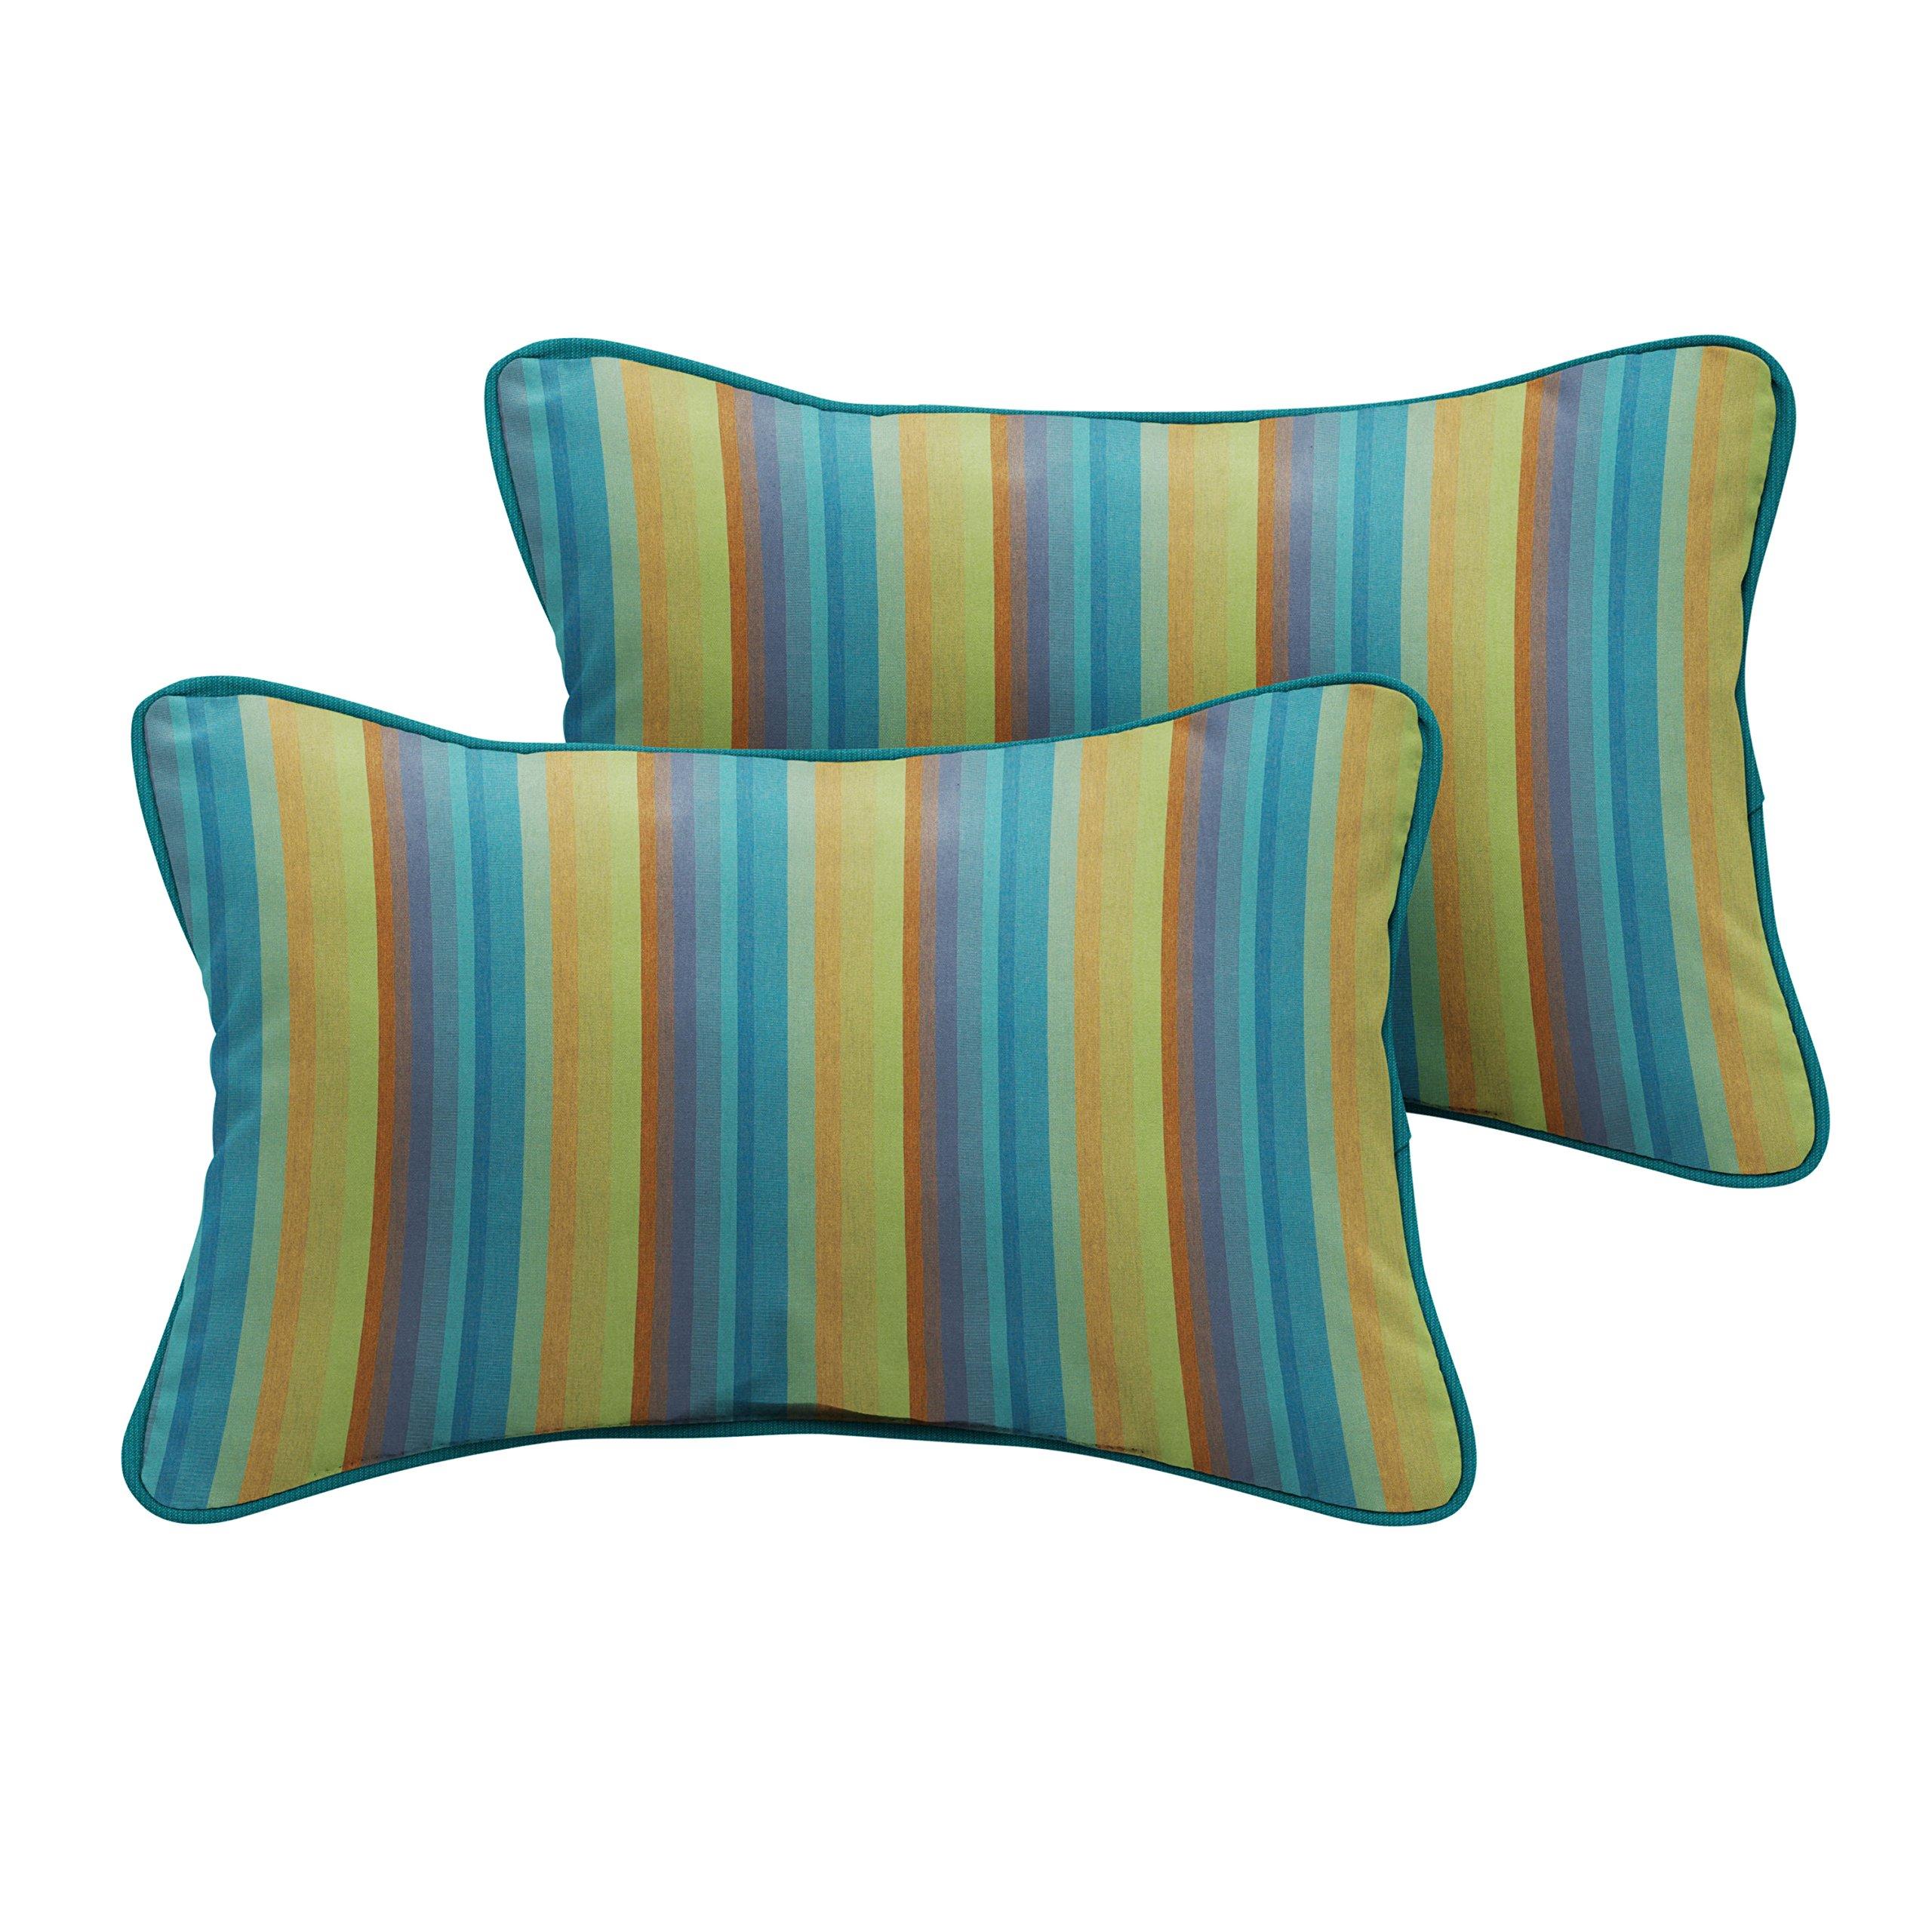 Mozaic Company Sunbrella Indoor/ Outdoor 18'' x 12'' Corded Lumbar Pillows, Astoria Lagoon Stripe and Spectrum Peacock, Set of 2